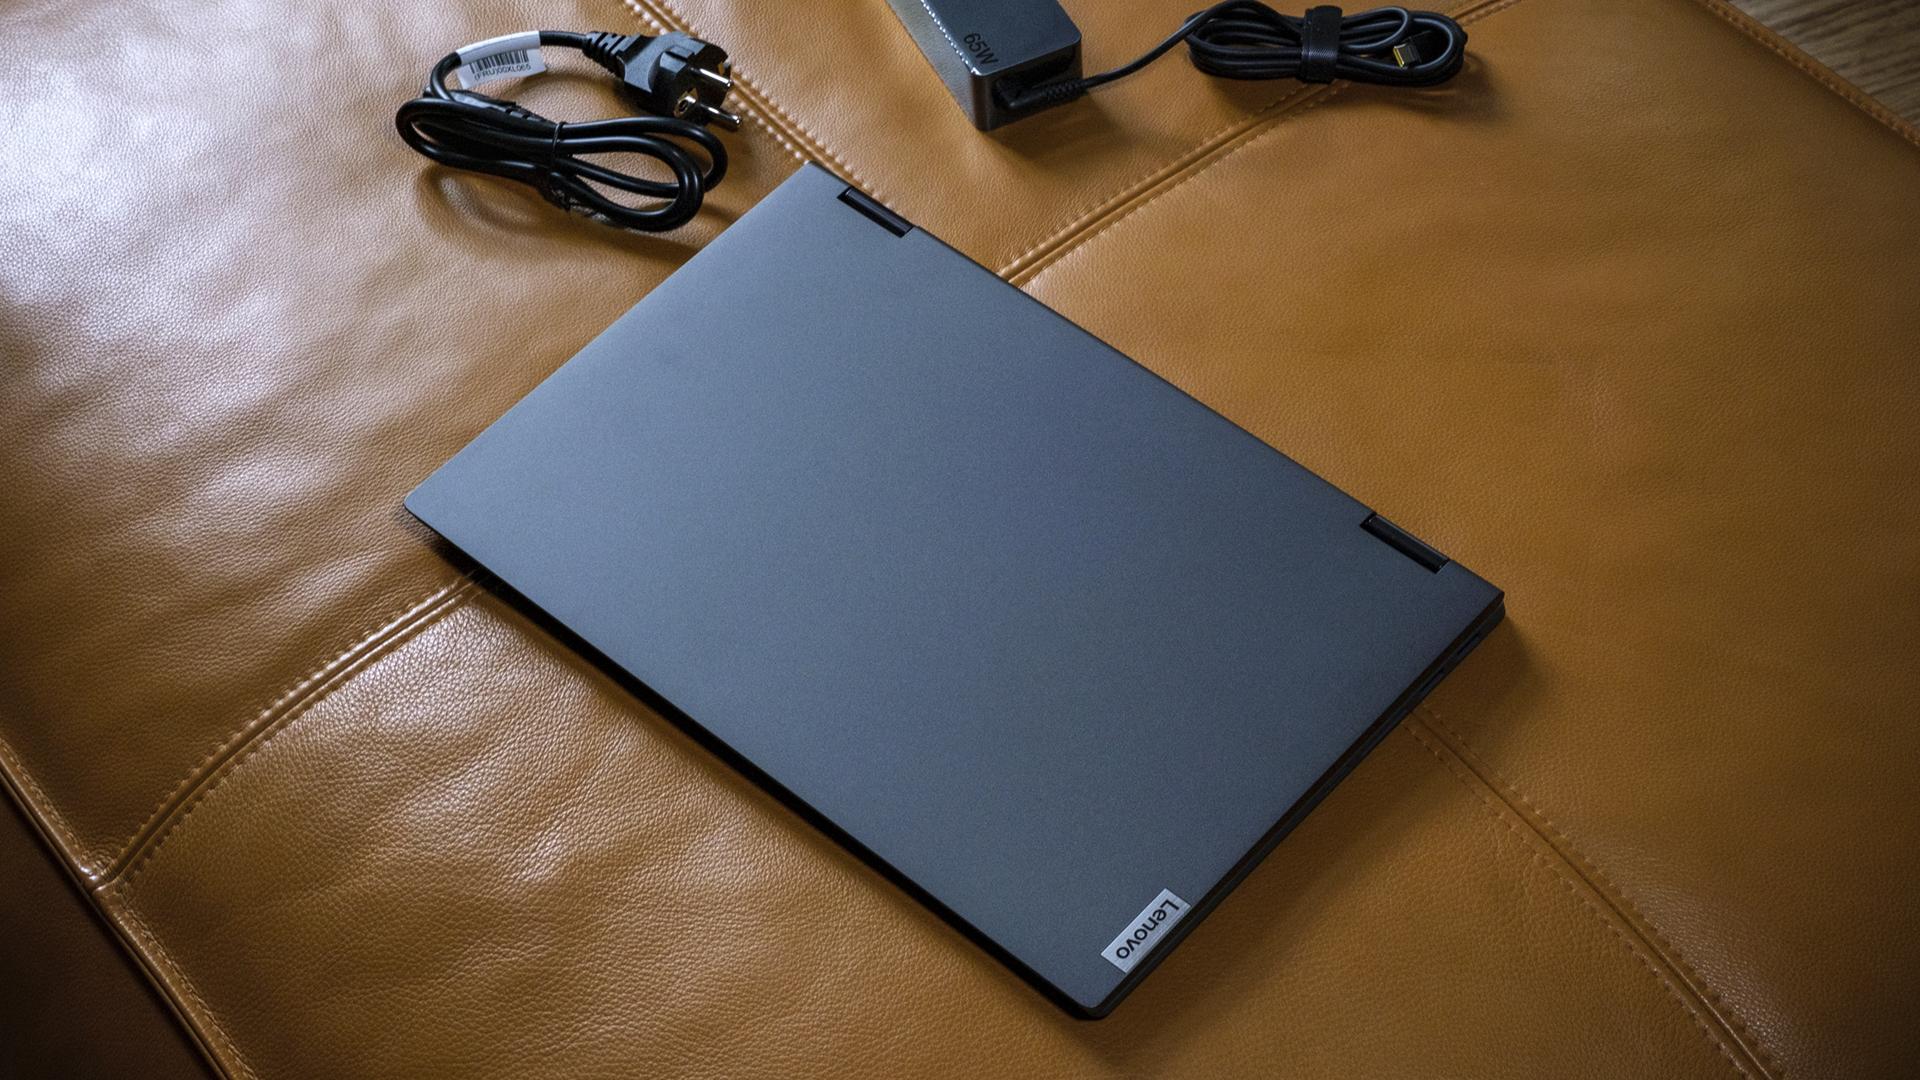 Lenovo IdeaPad Flex 5 AMD Ryzen 5700U Zubehör